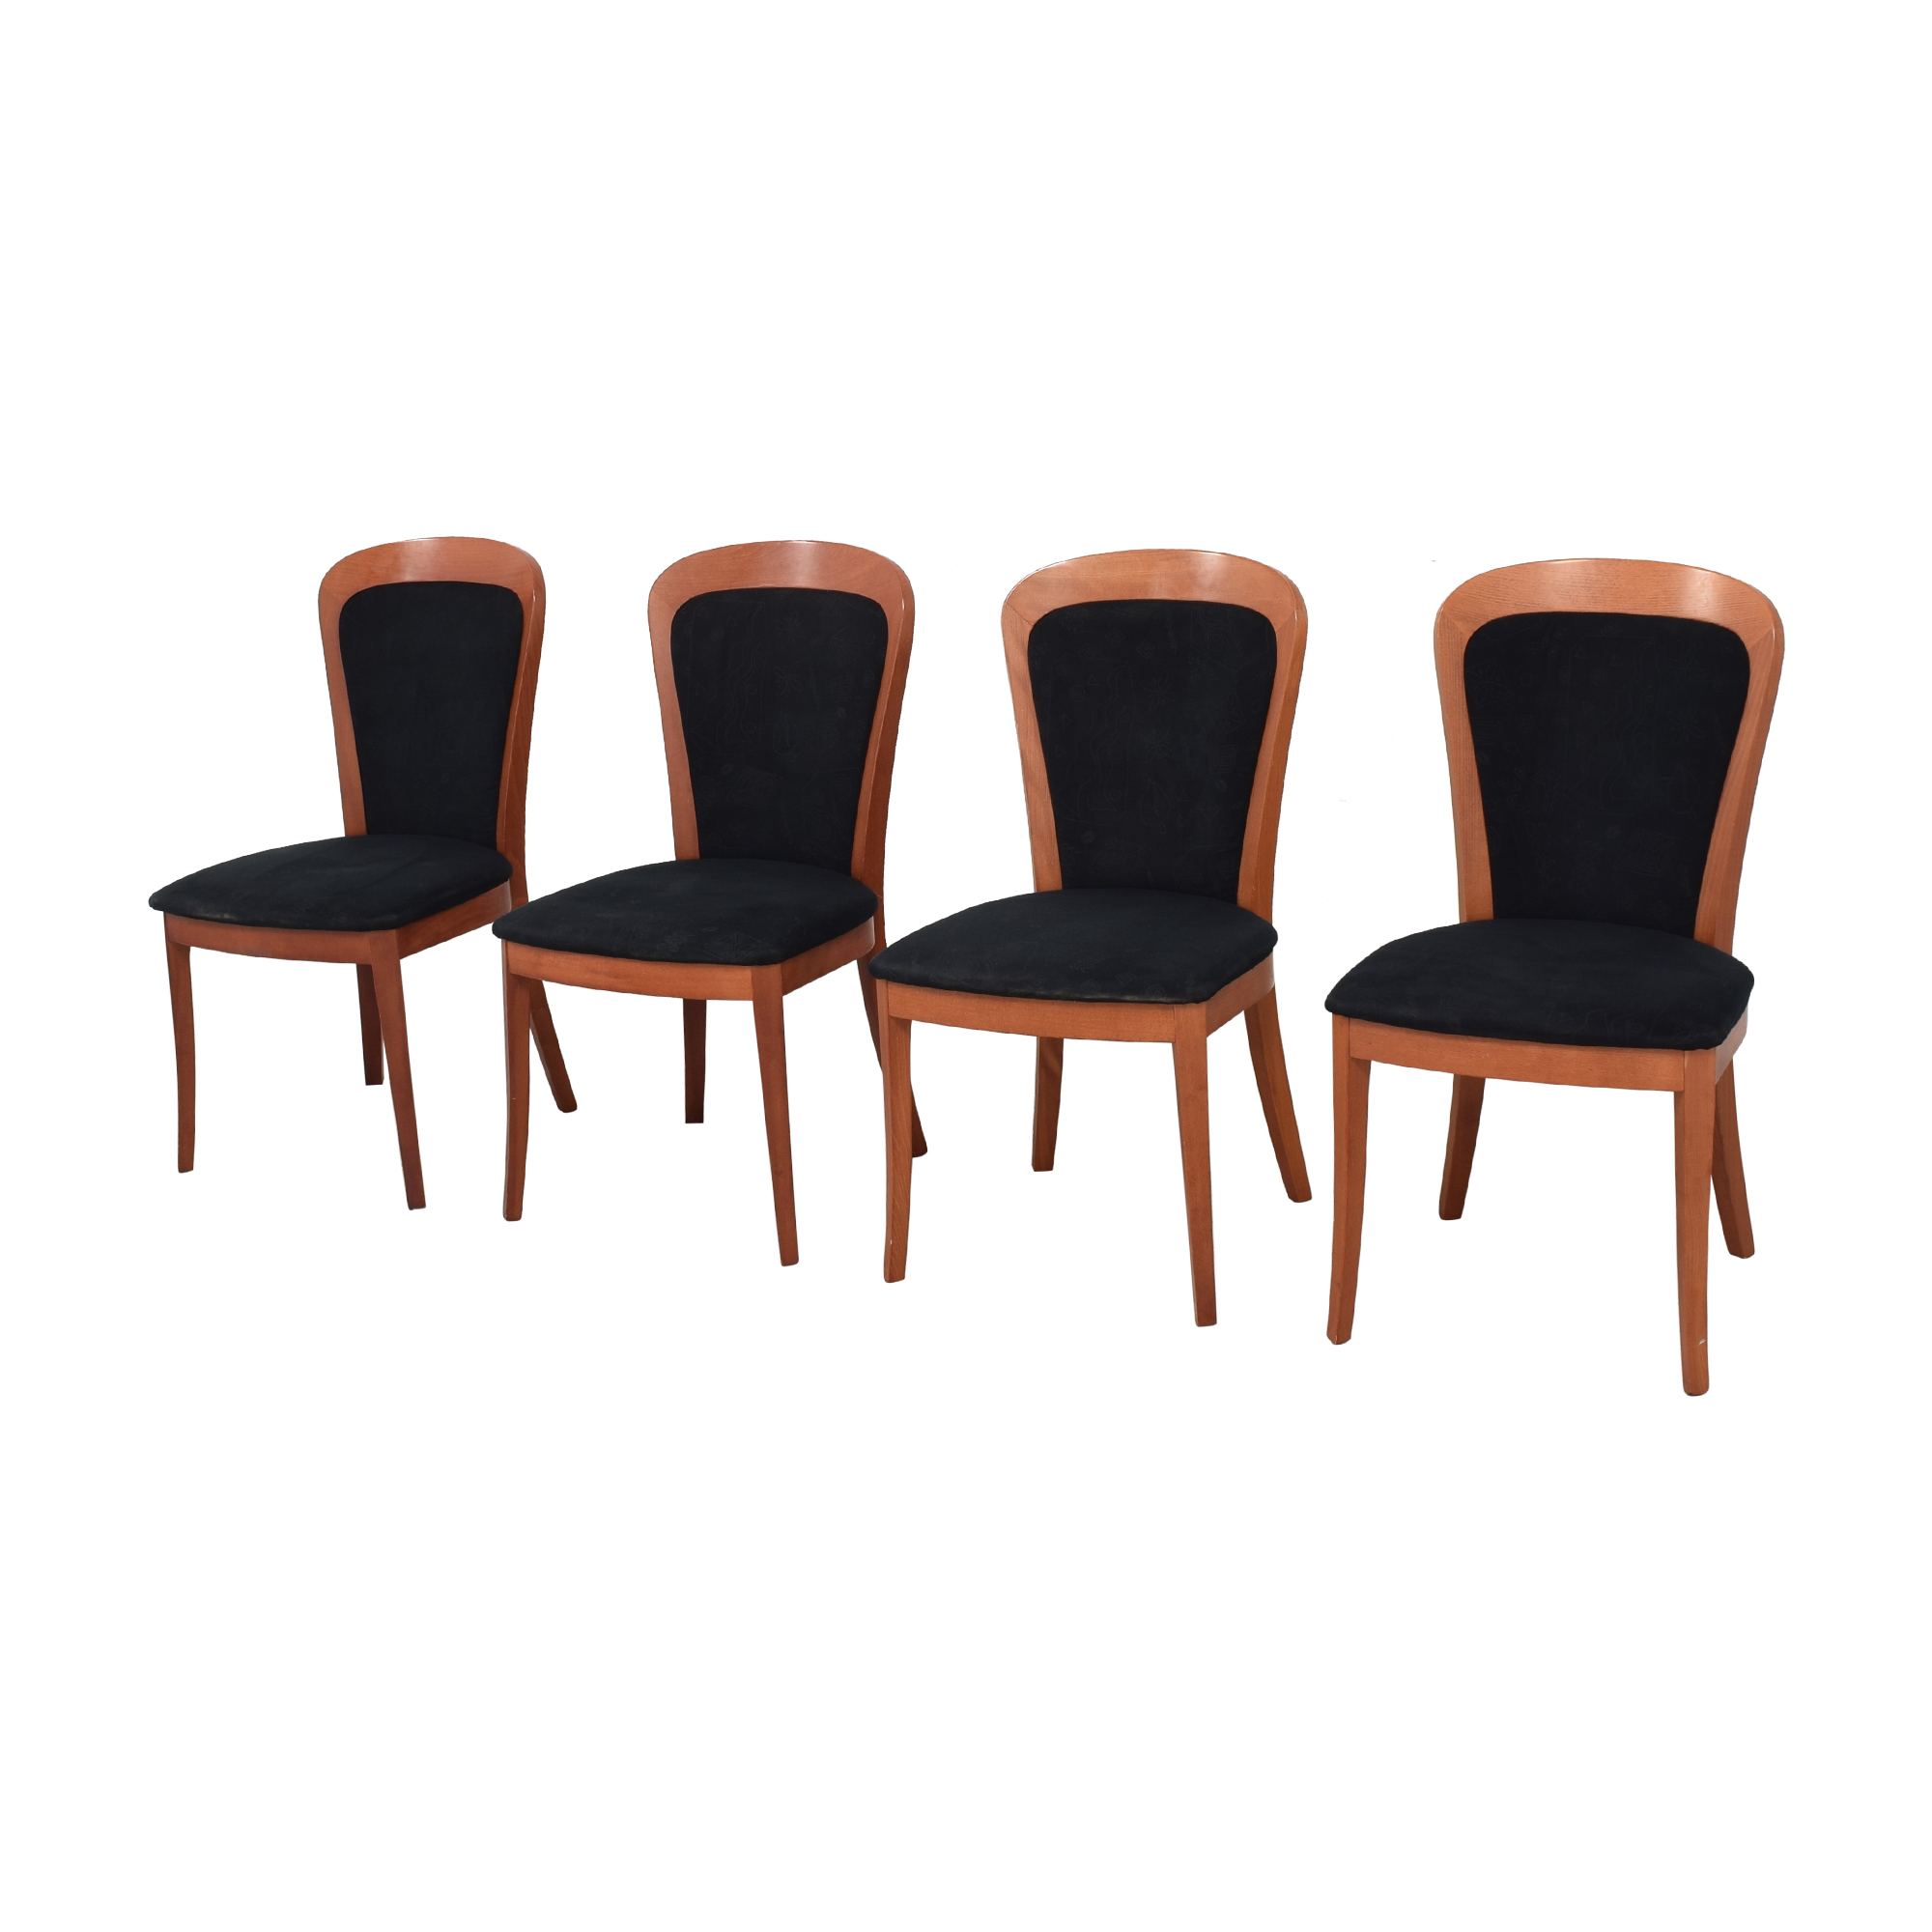 SA A. Sibau SA A. Sibau Dining Chairs nj